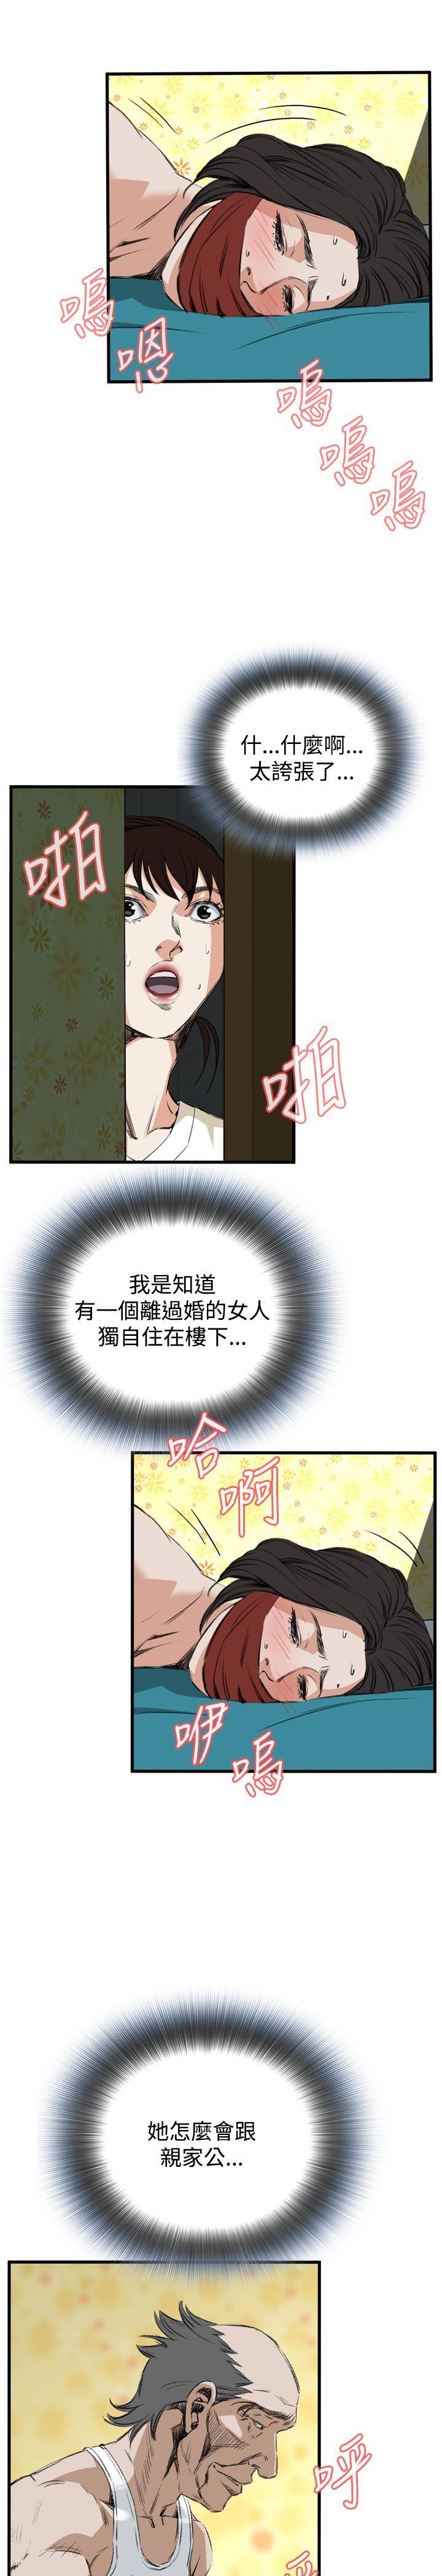 Take a Peek 偷窥 Ch.39~51 [Chinese]中文 161